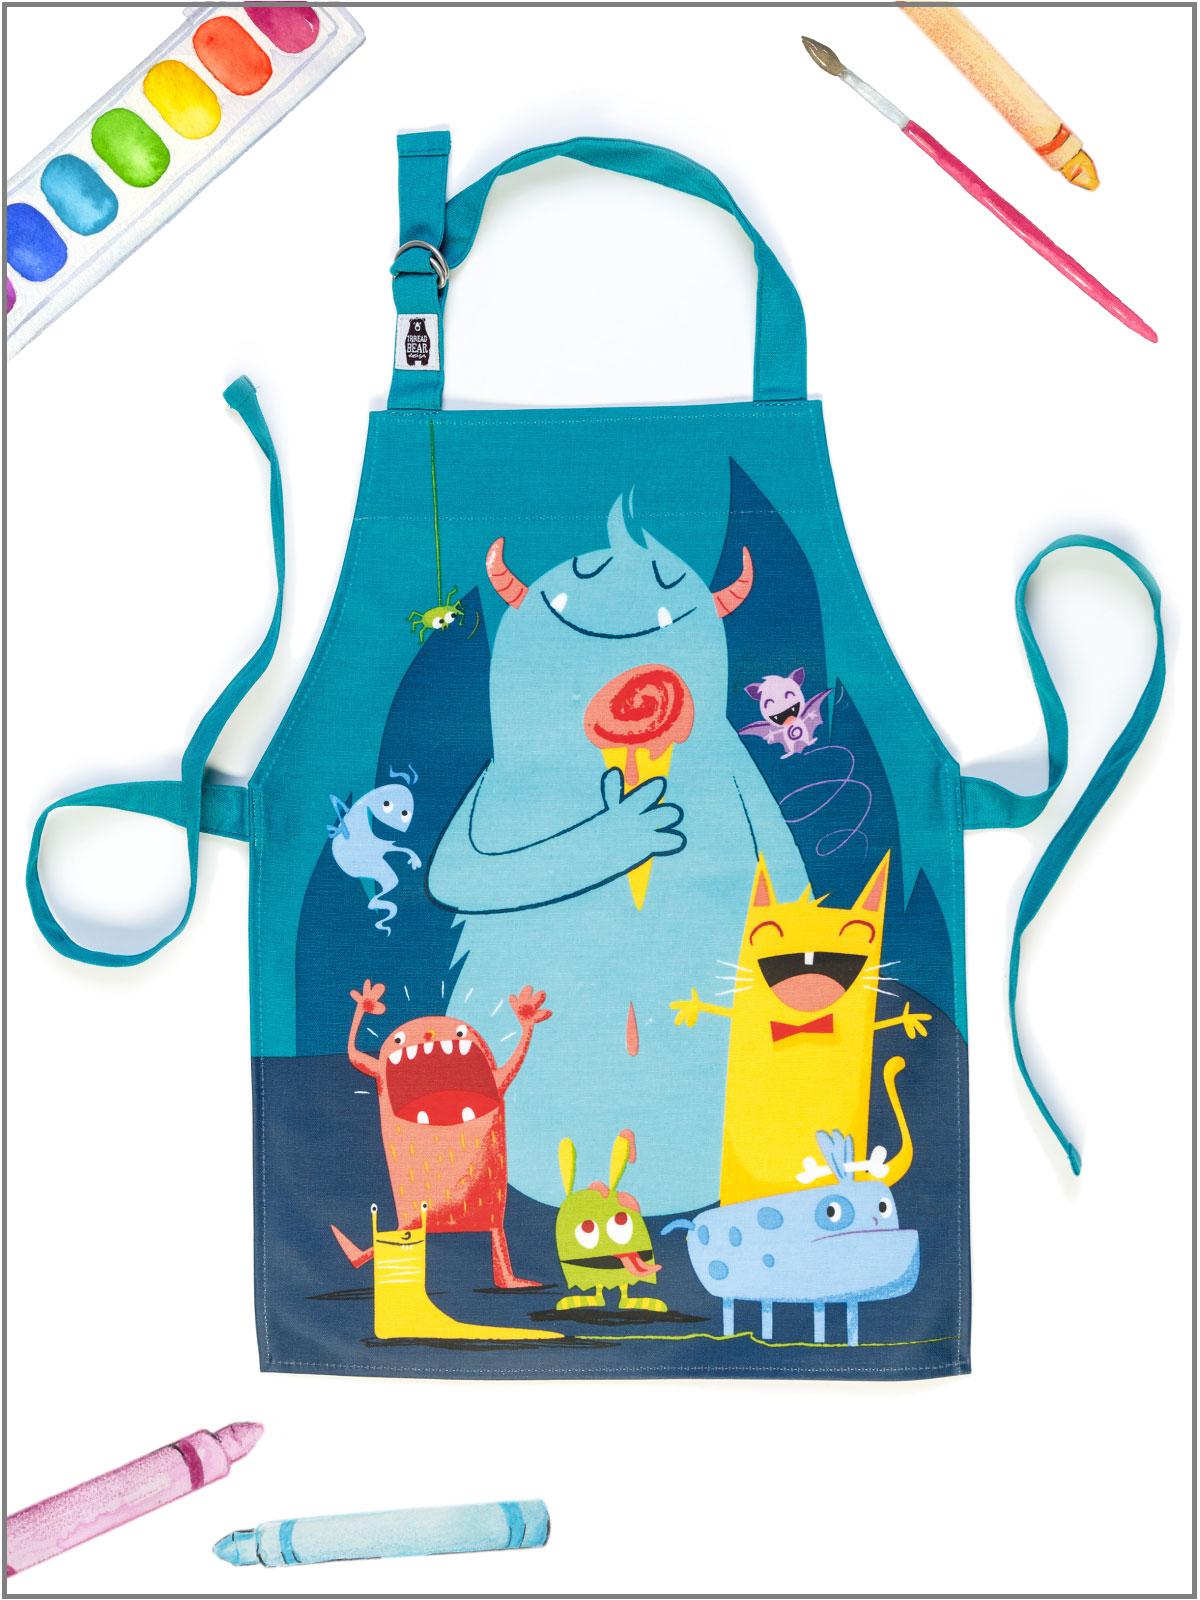 frederickandsophie-kids-toys-threadbear_design-apron-monsters-art-crafts-artist-play